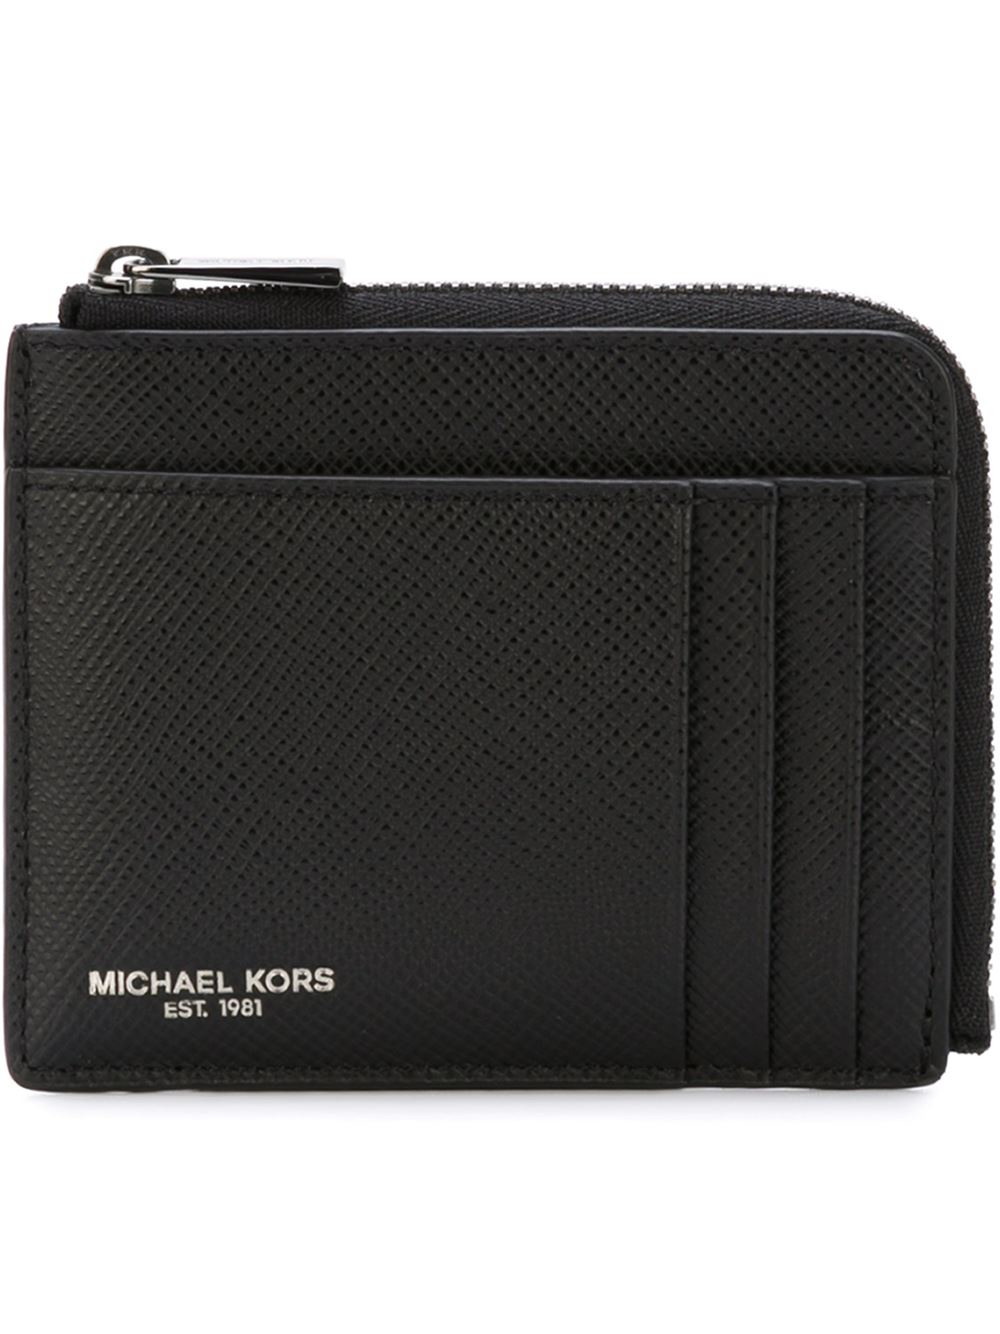 michael kors zip around wallet in black for men lyst. Black Bedroom Furniture Sets. Home Design Ideas